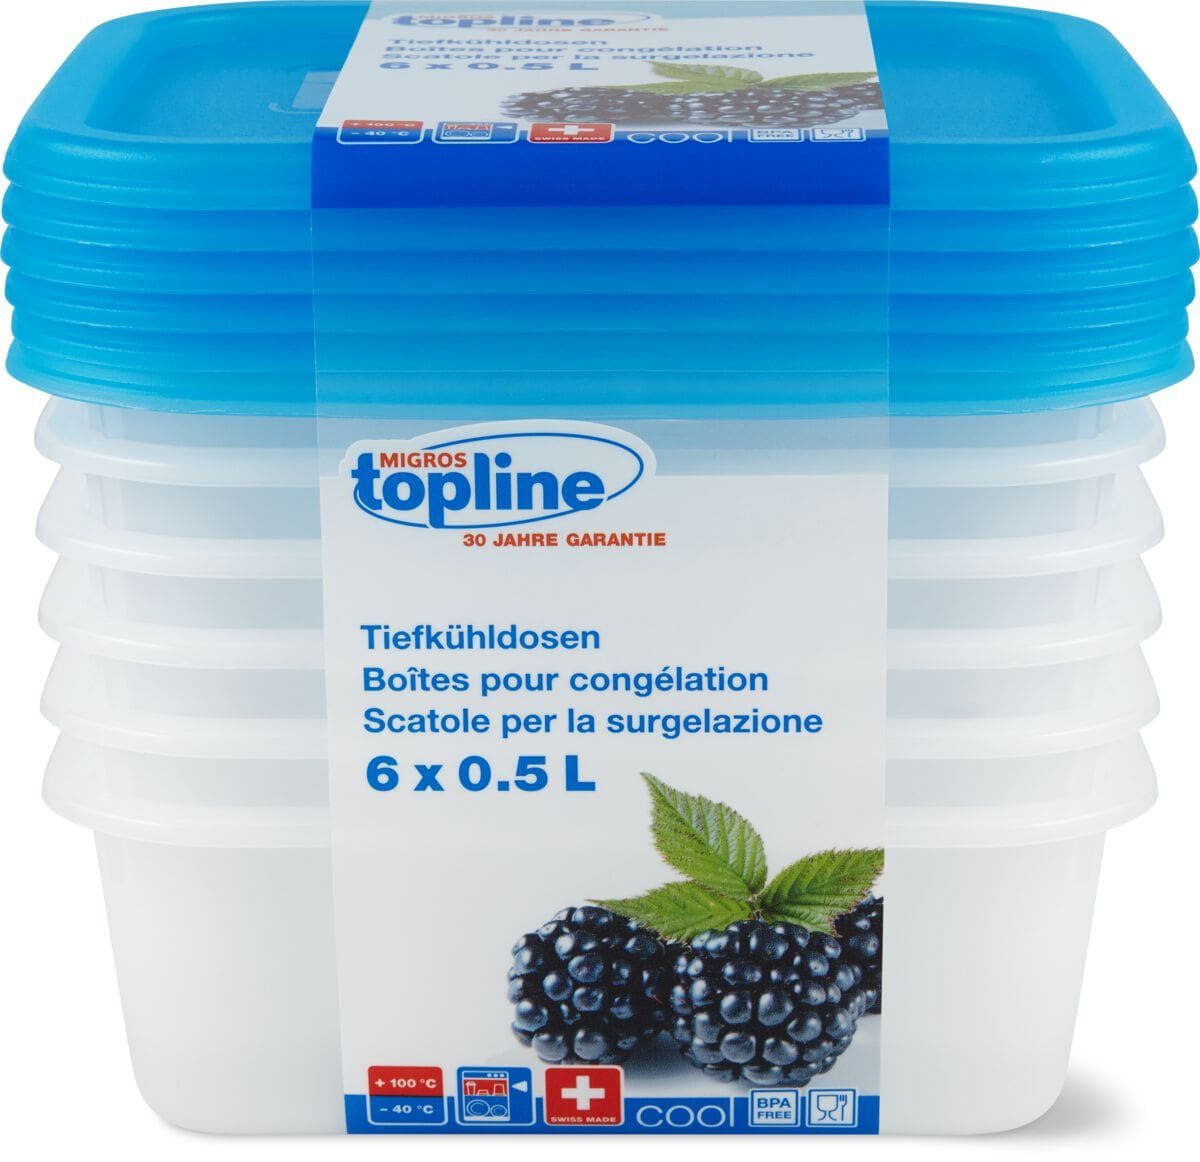 M-Topline COOL Tiefkühldose 0.5L